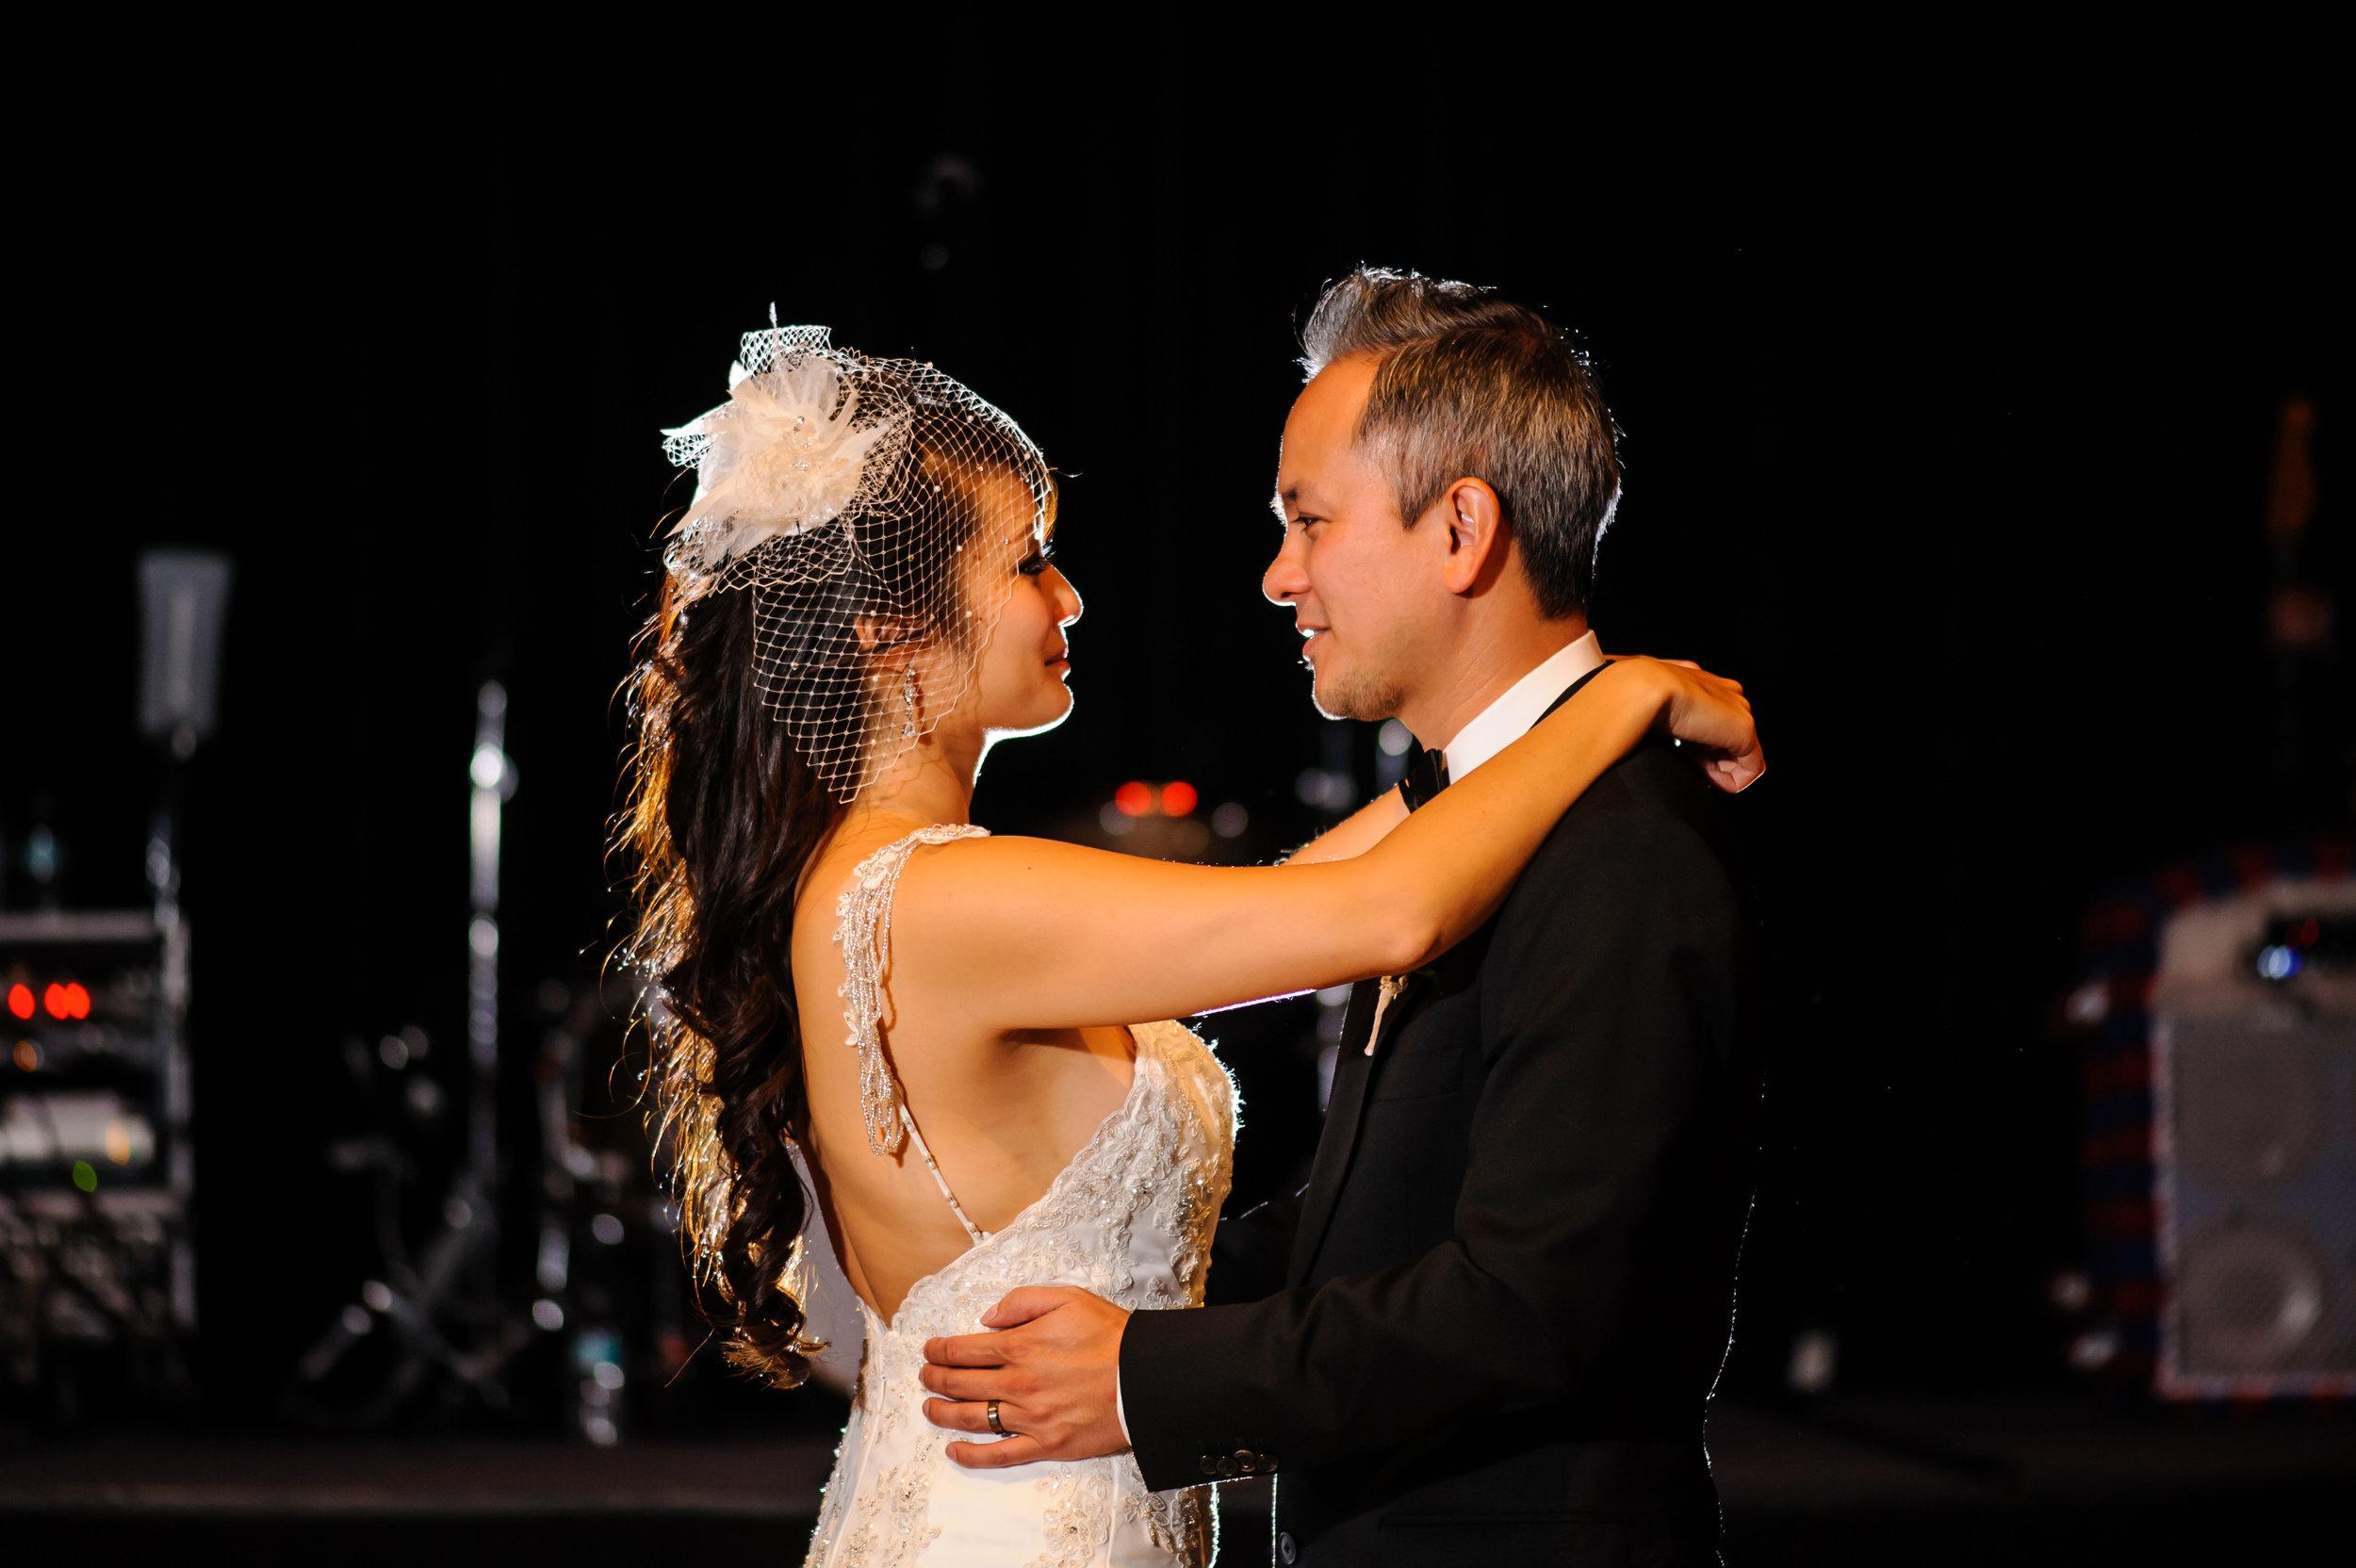 camilla-thuy-070-memorial-auditorium-sacramento-wedding-photographer-katherine-nicole-photography.JPG